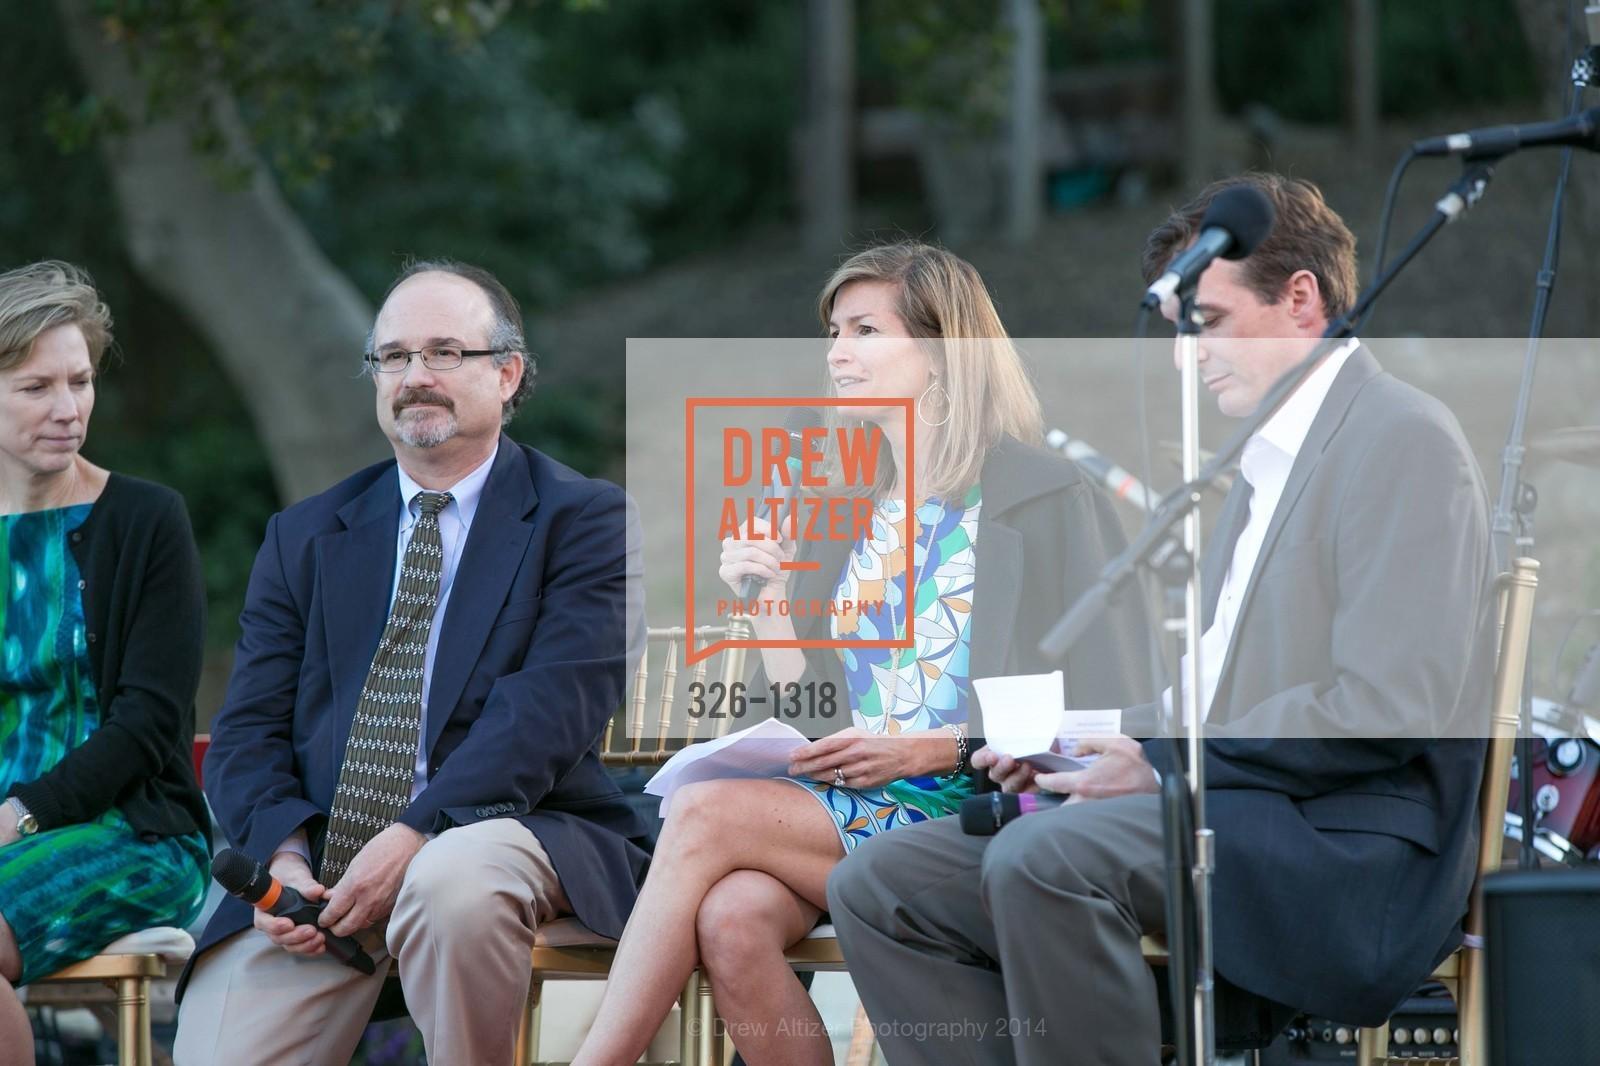 Wendy Adams, John Aucott, Carin Rollins, William Robinson, Bay Area Lyme Foundation's LymeAid 2014, 884 Portola Road, Suite A7. Portola Valley, CA 94028, April 27th, 2014